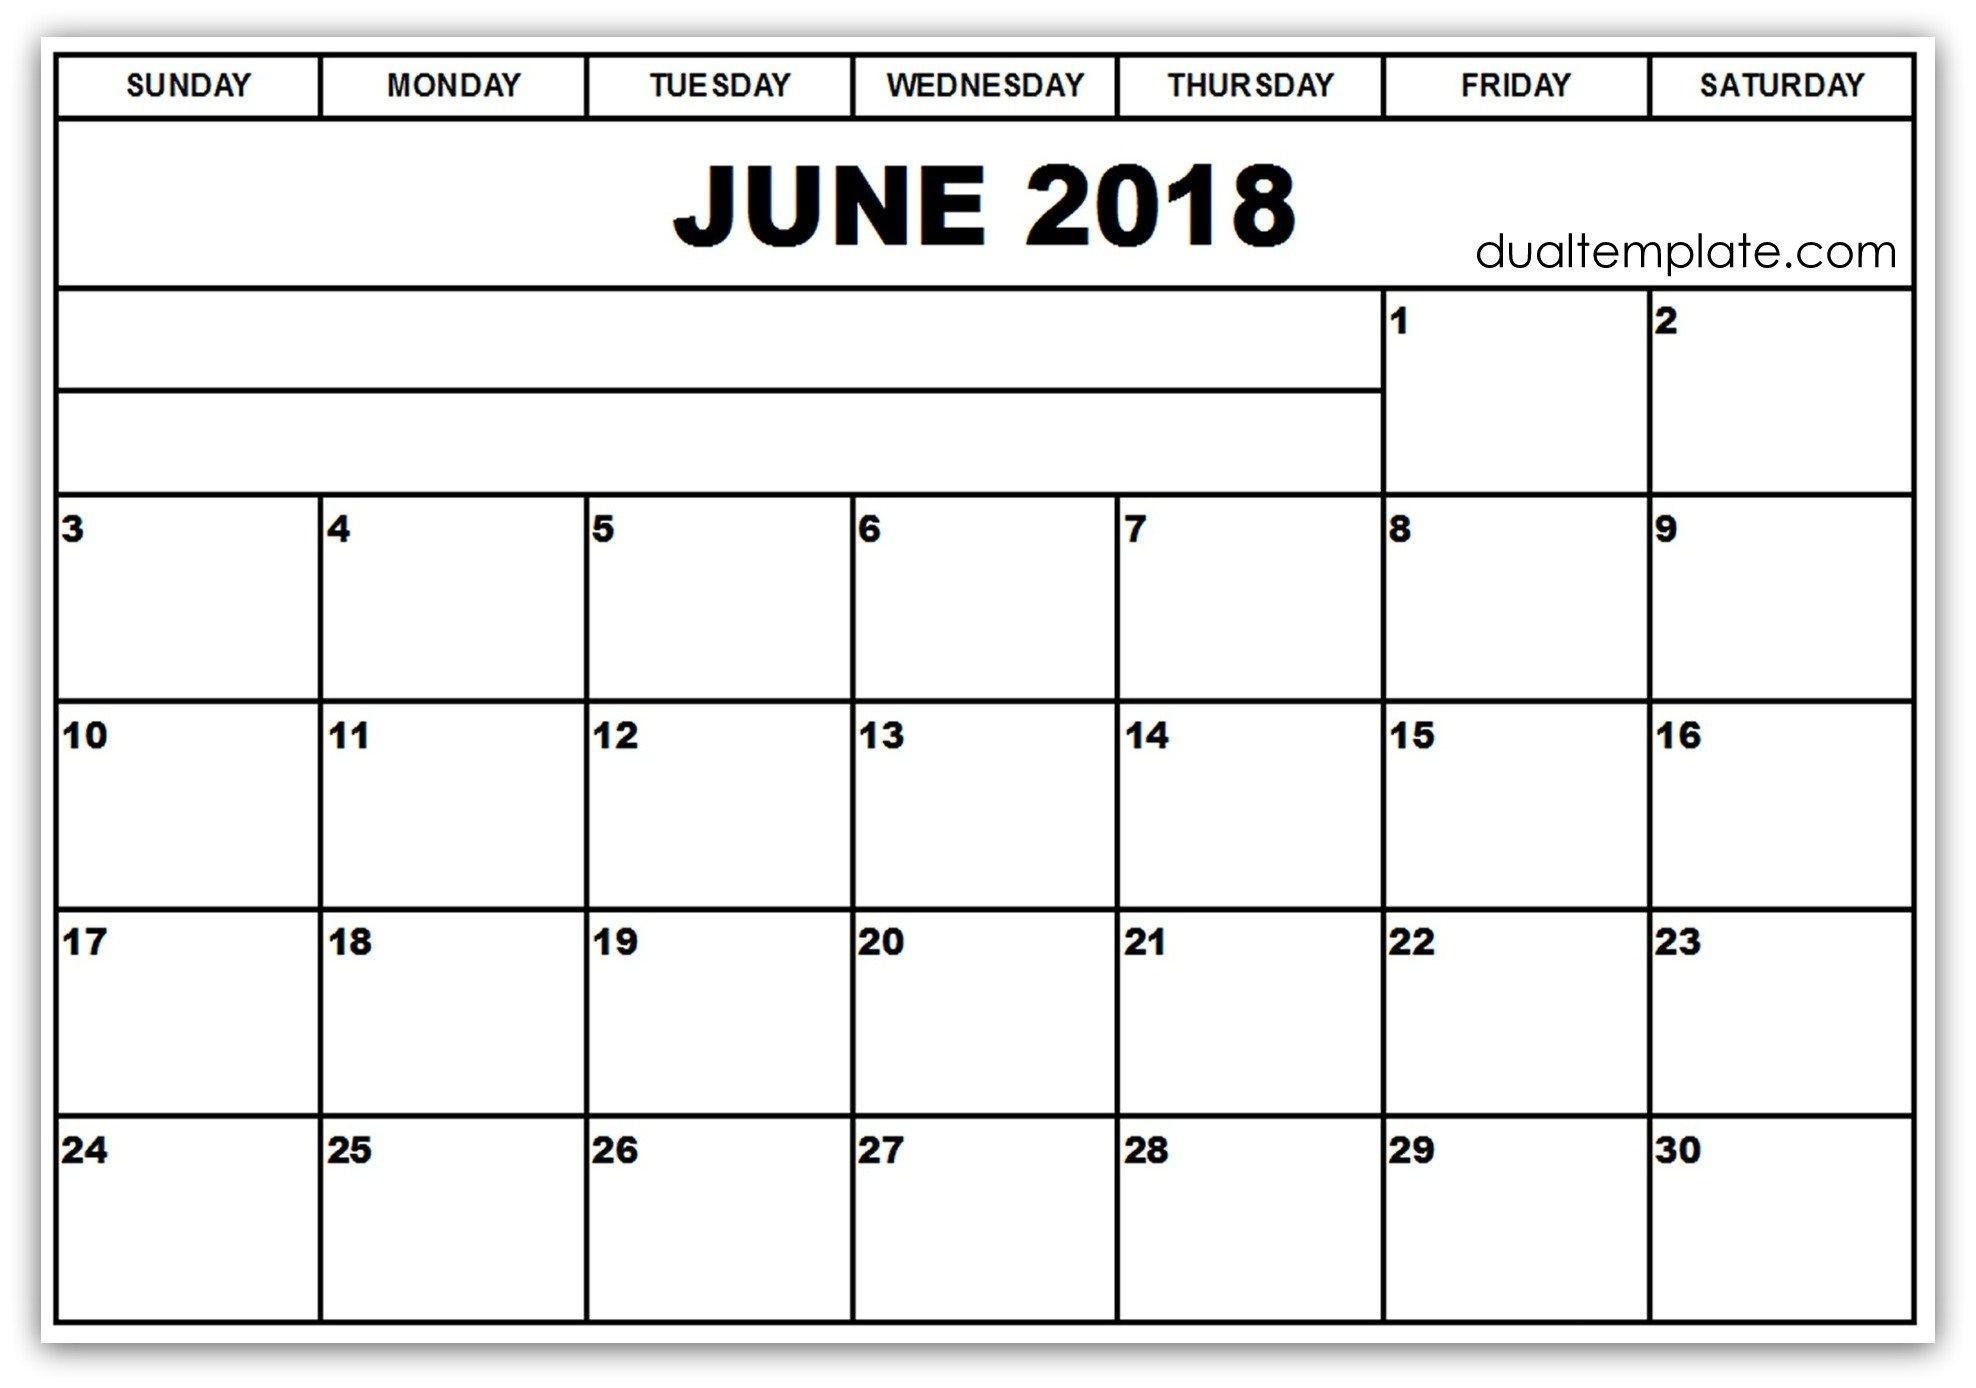 Julian Date Calendar Printable theminecraftserver Best